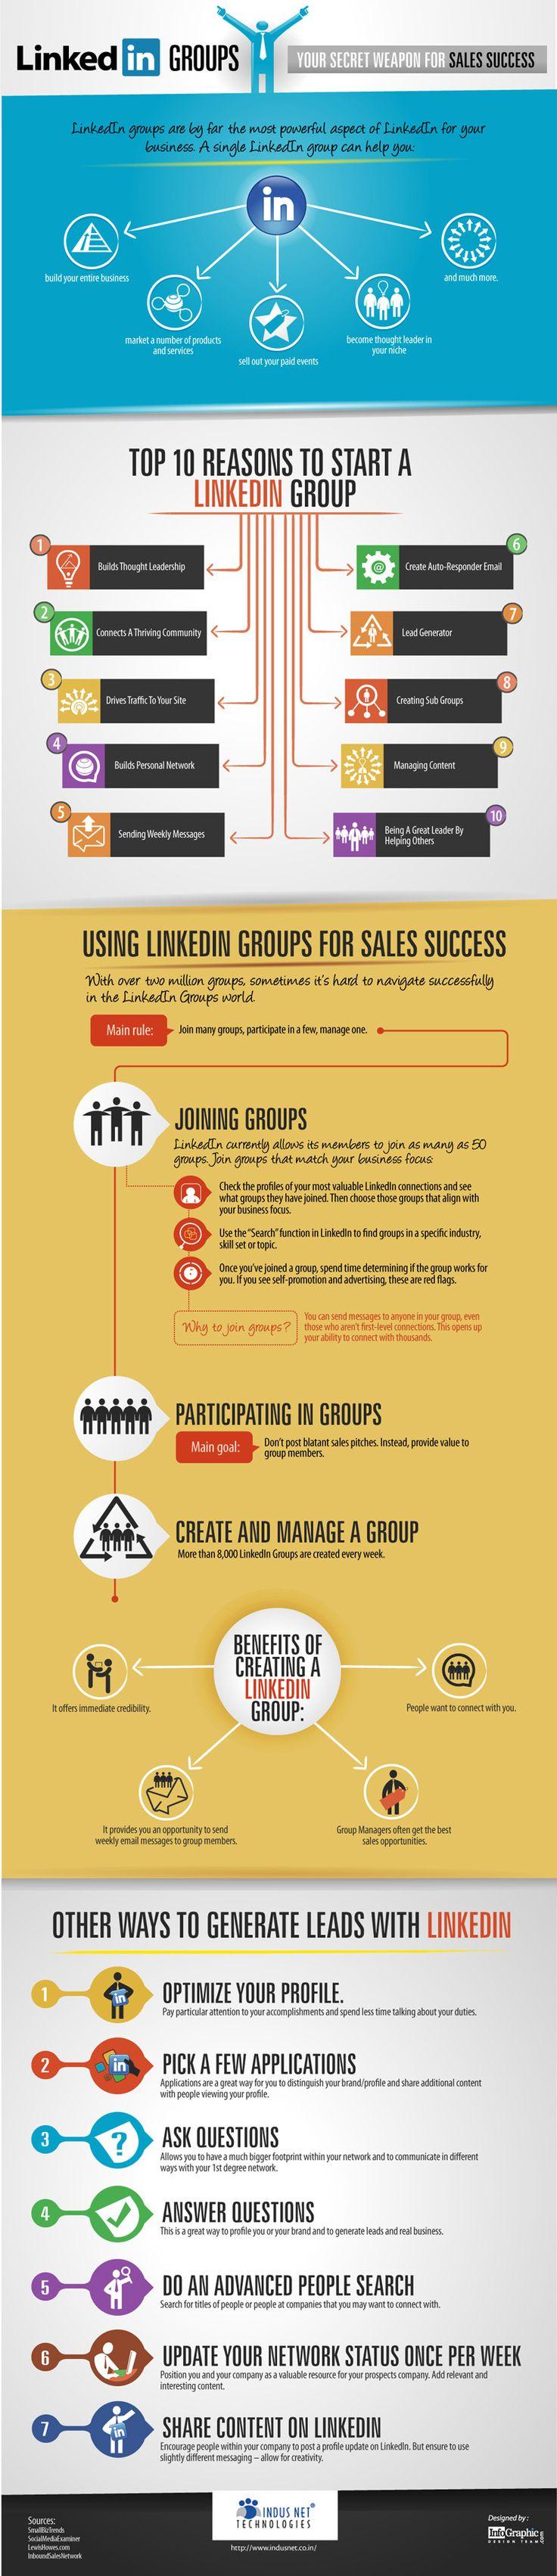 Linkedin Groups - Your Secret Weapon For Sales Success